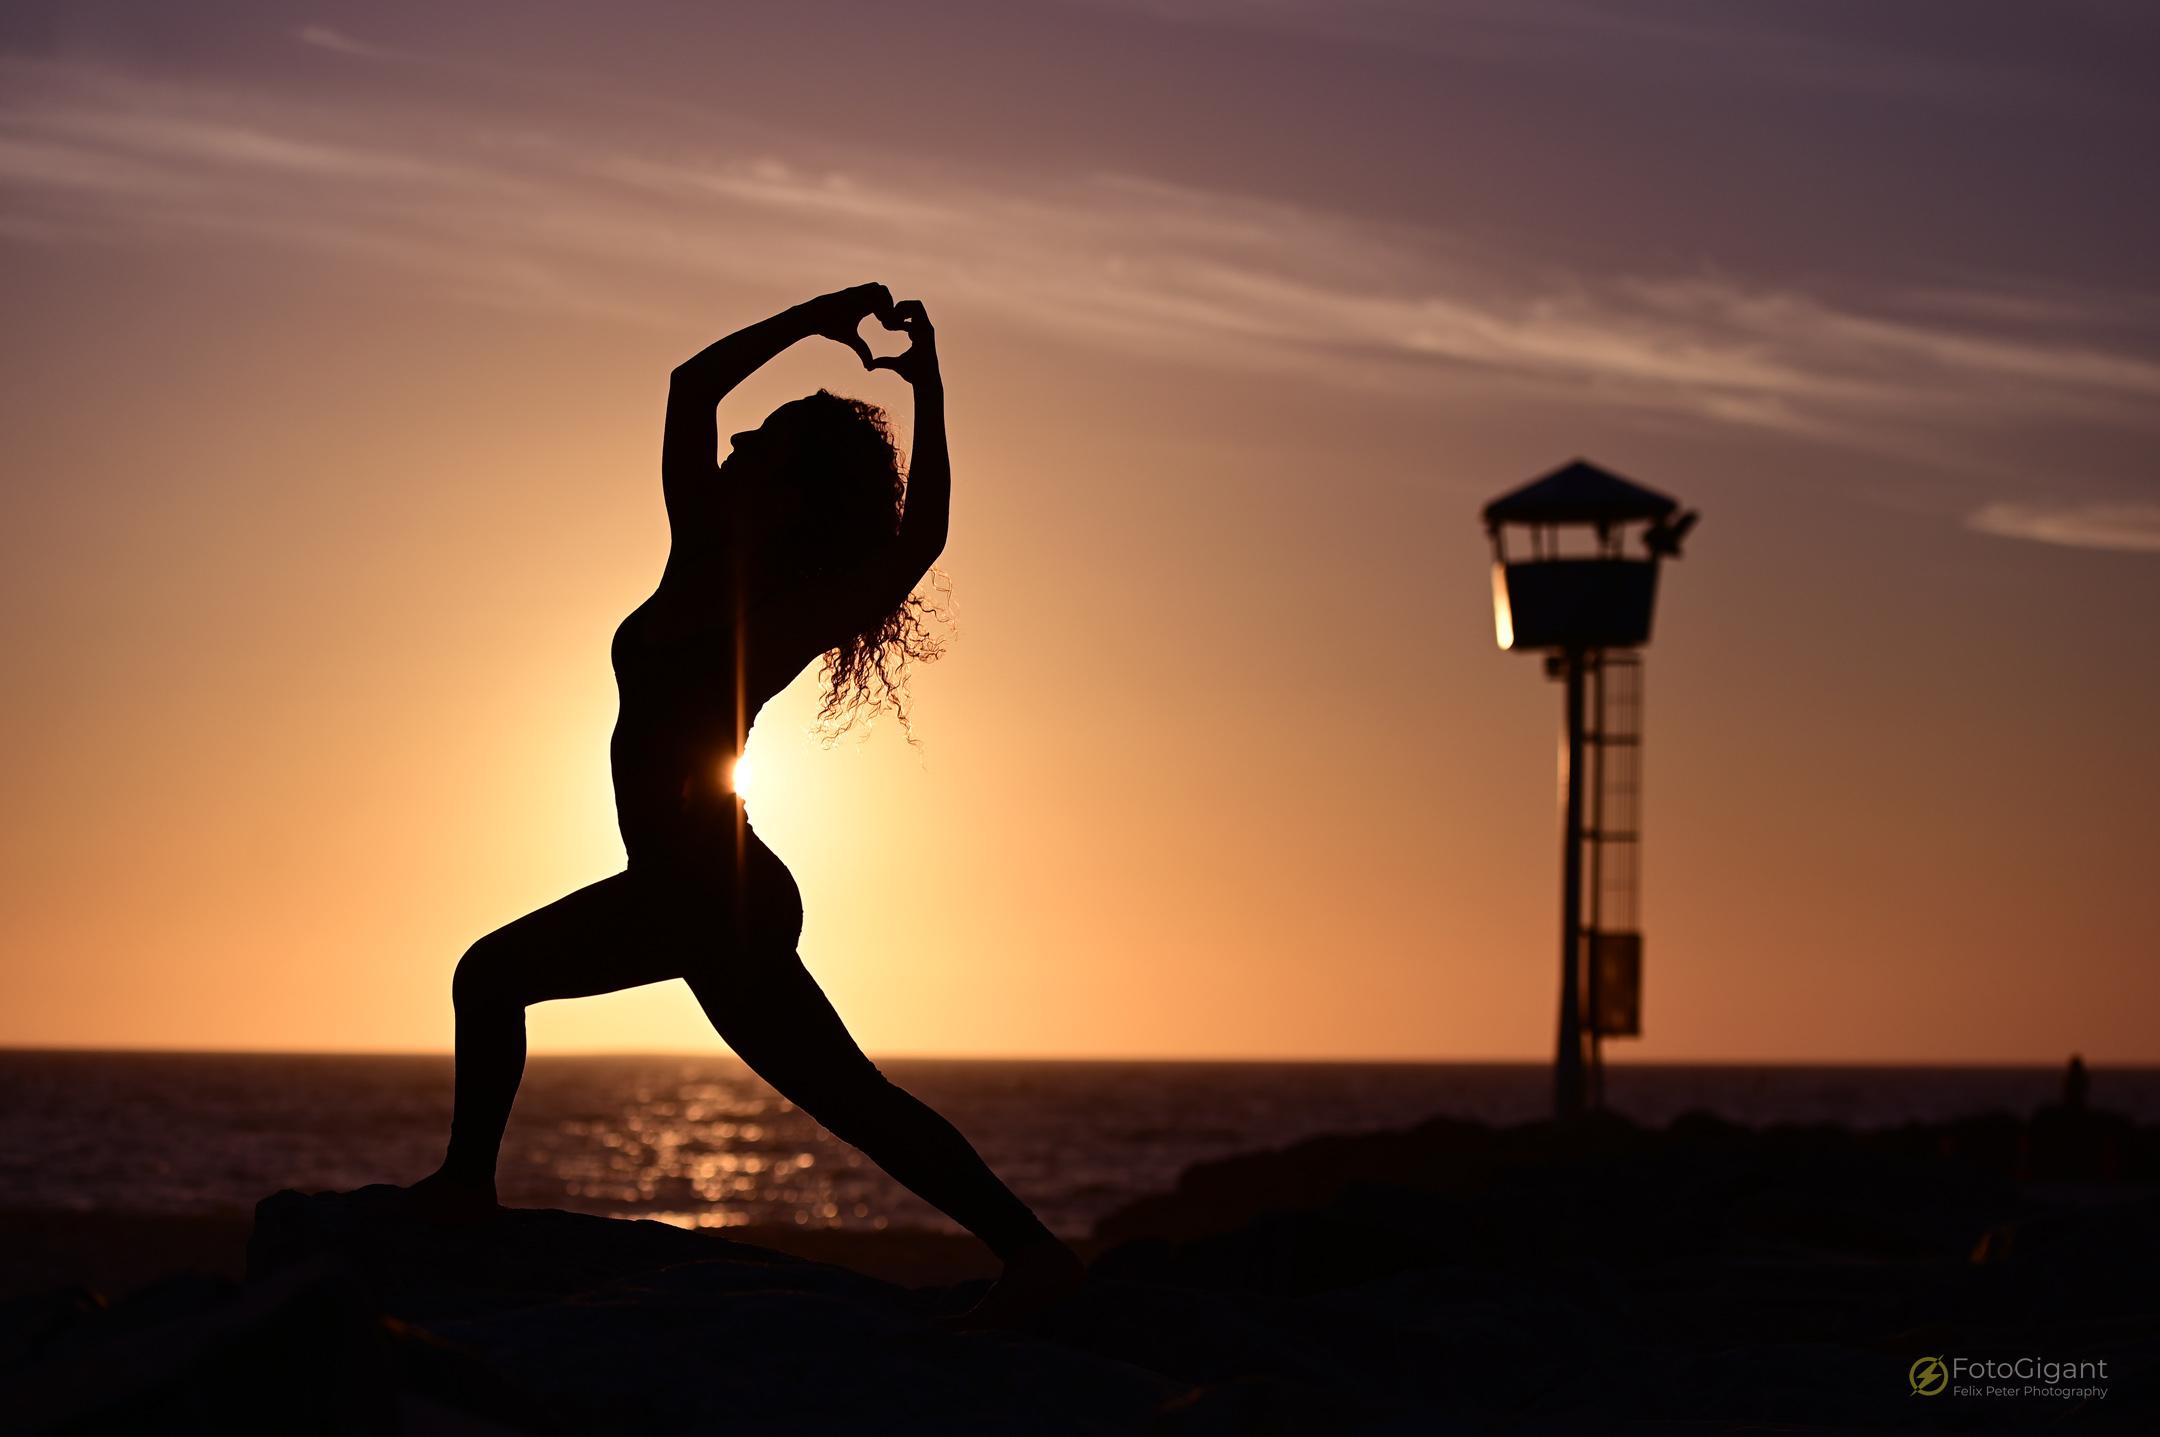 Pilates_Yoga_Silhouettes_02.jpg